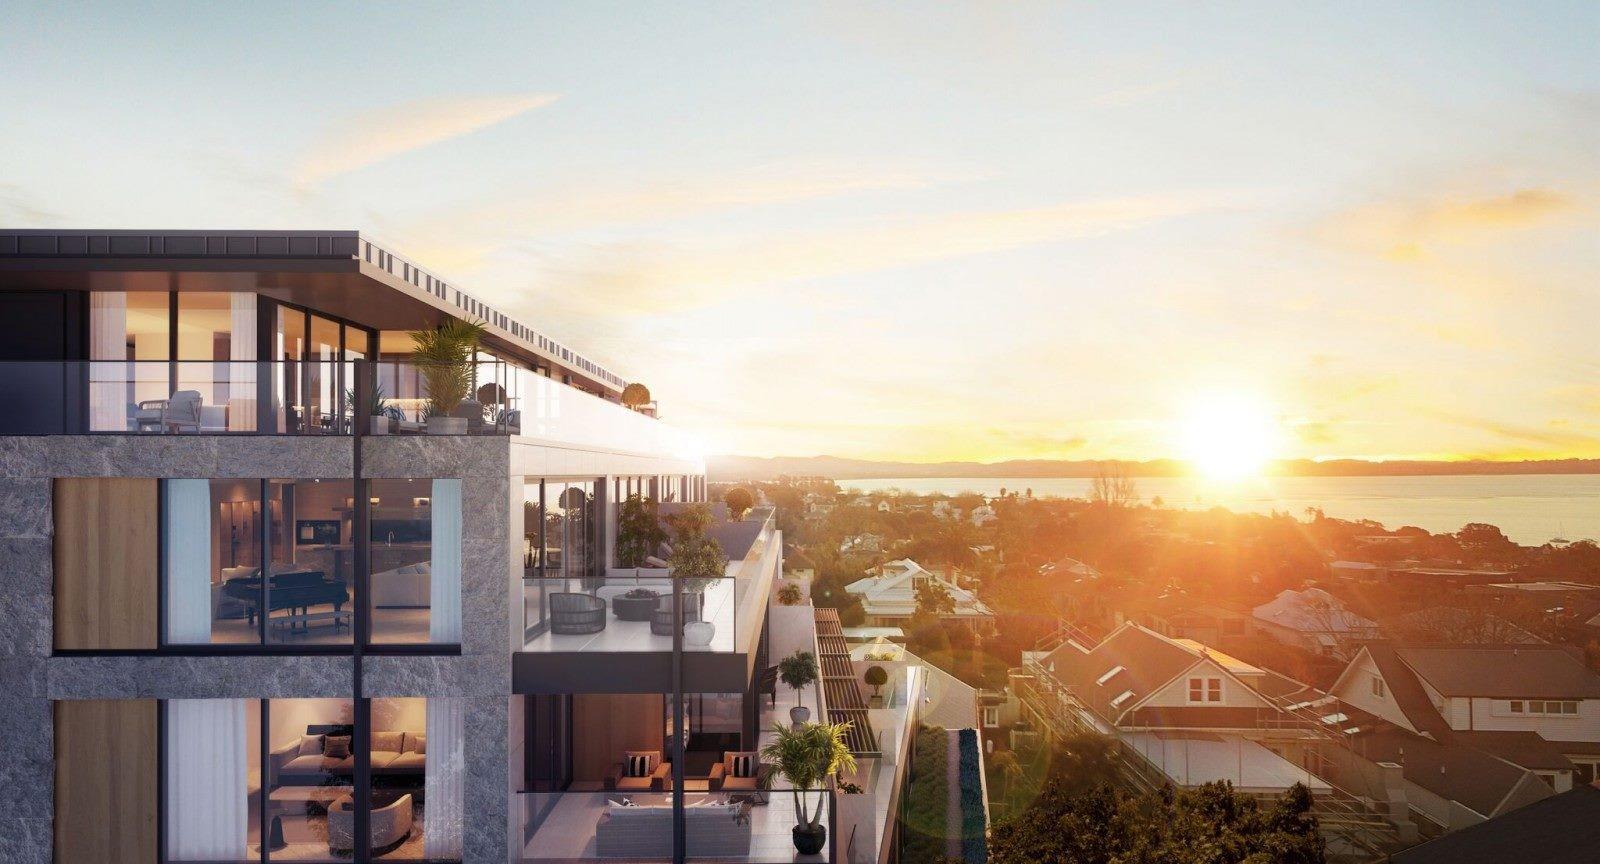 Jervois apartments - artist rendering